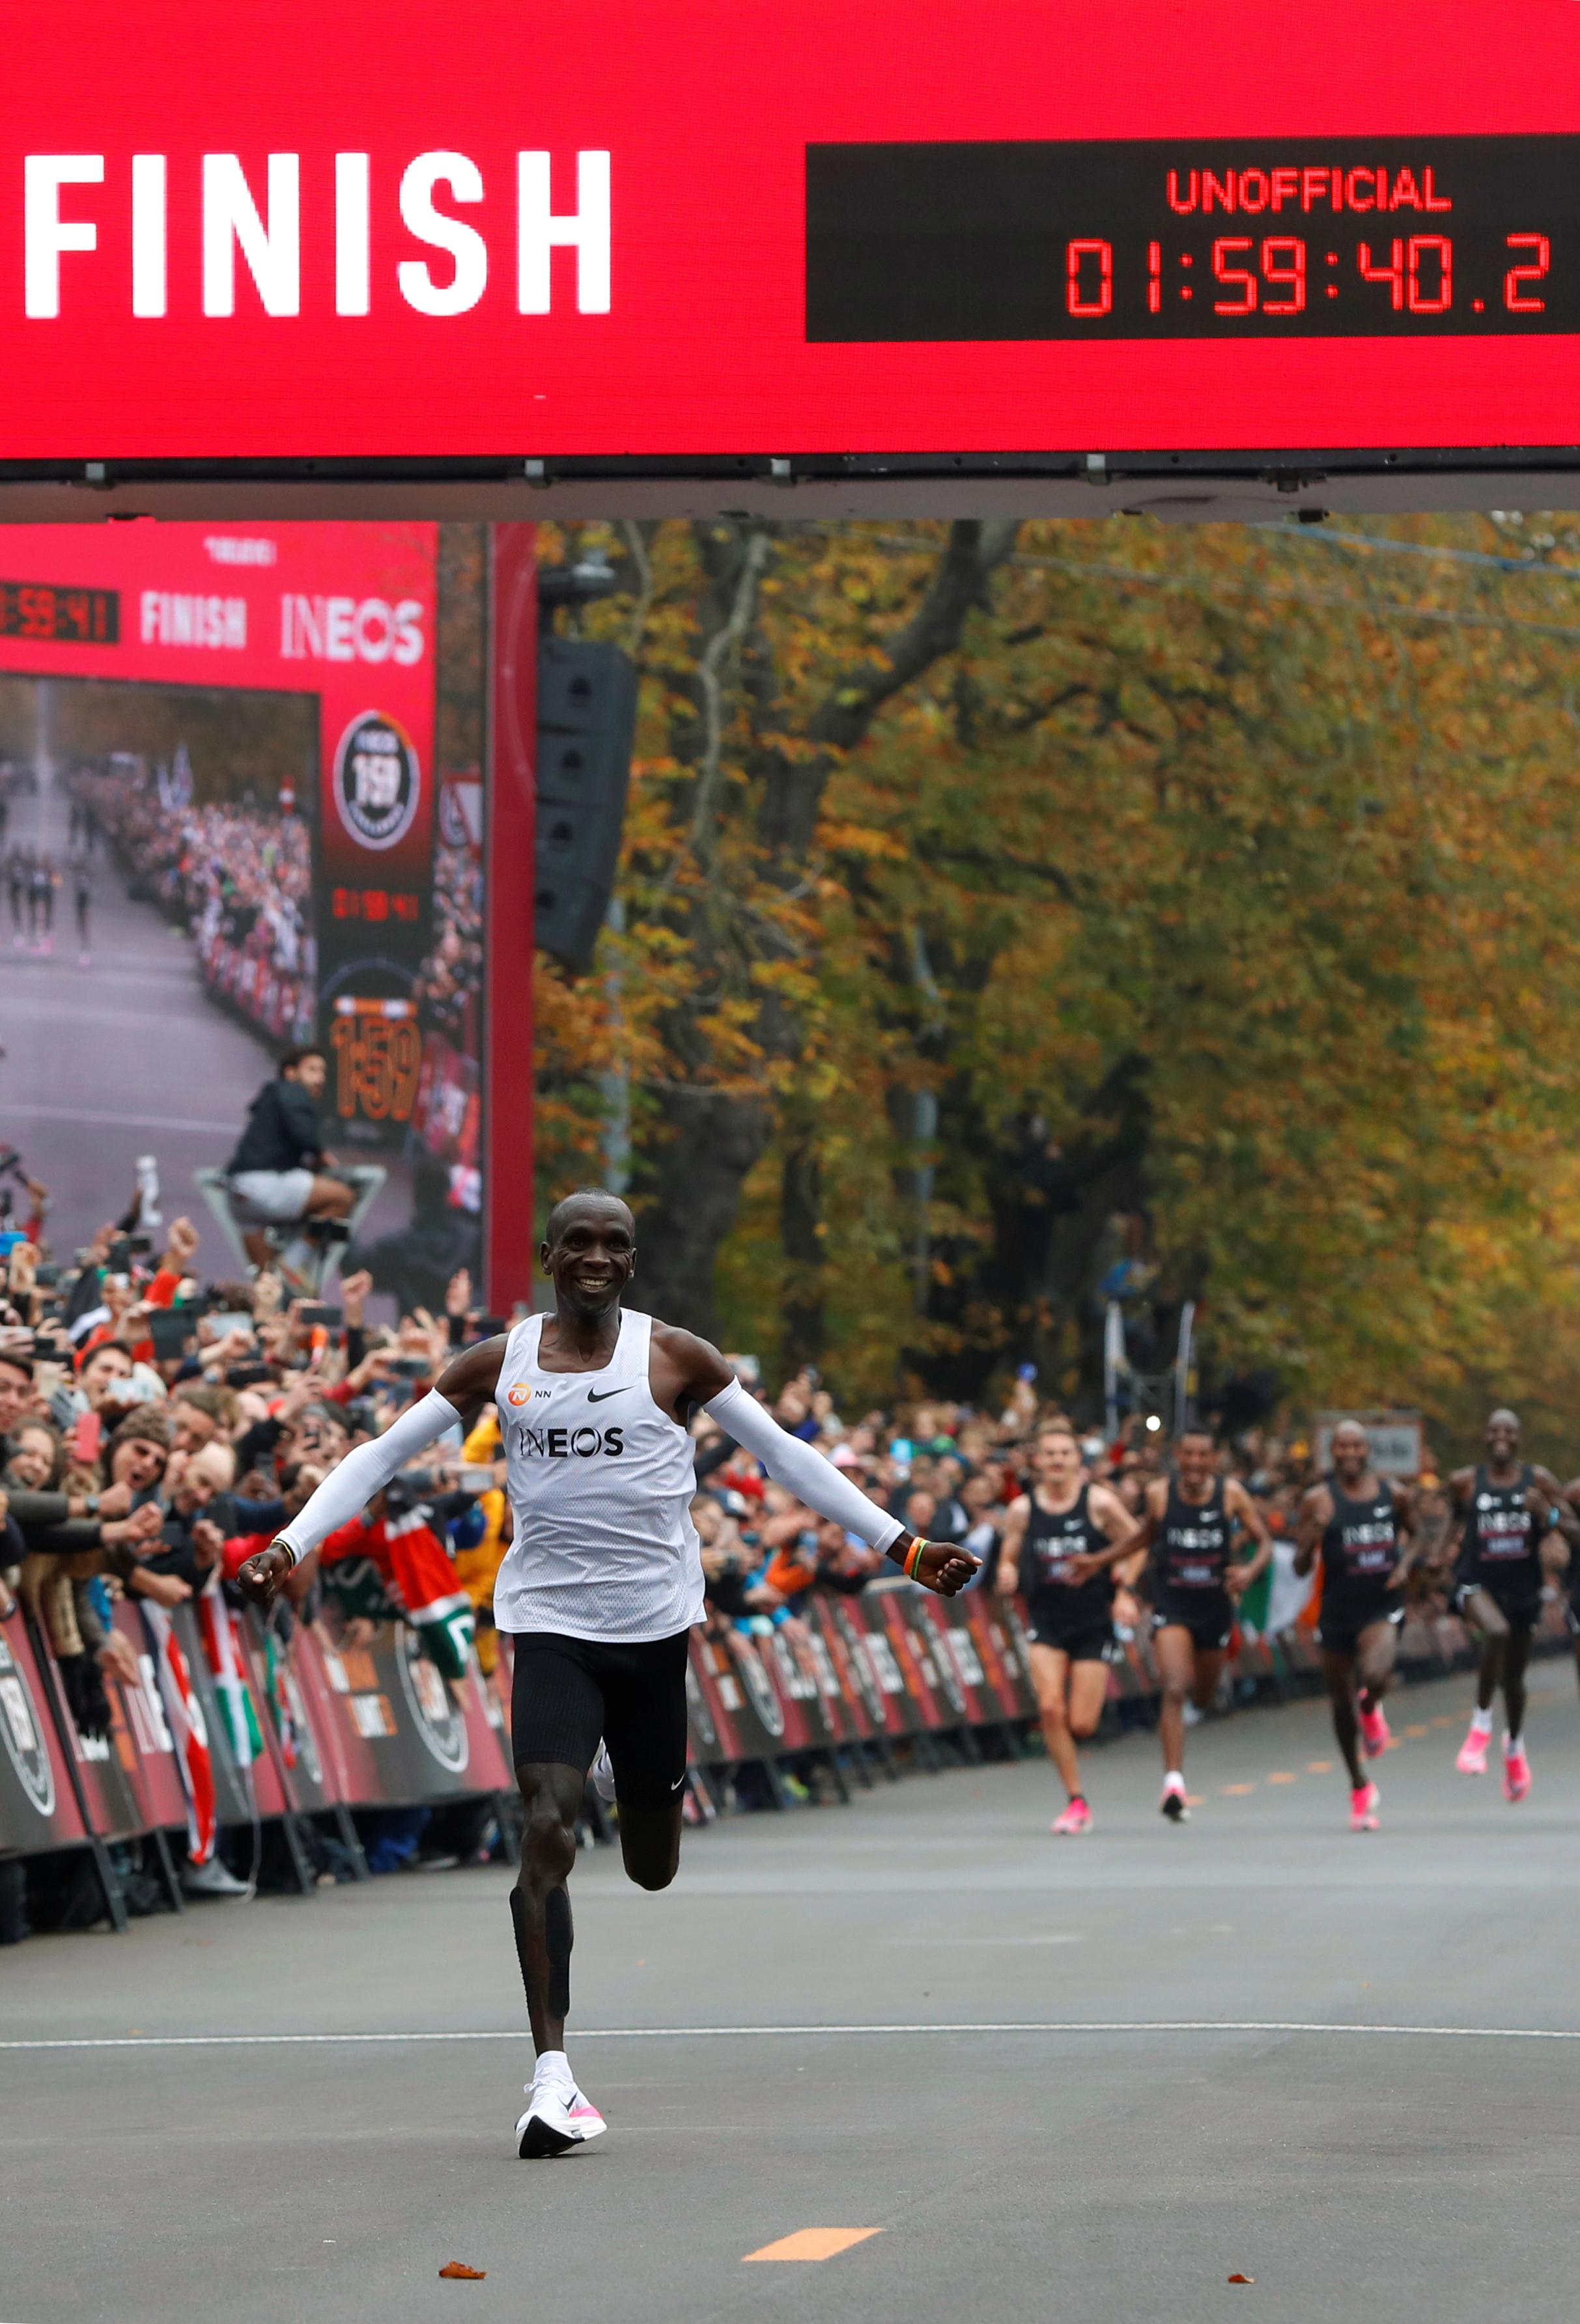 Eliud Kipchoge a reusit performanta de a termina un maraton complet sub doua ore.